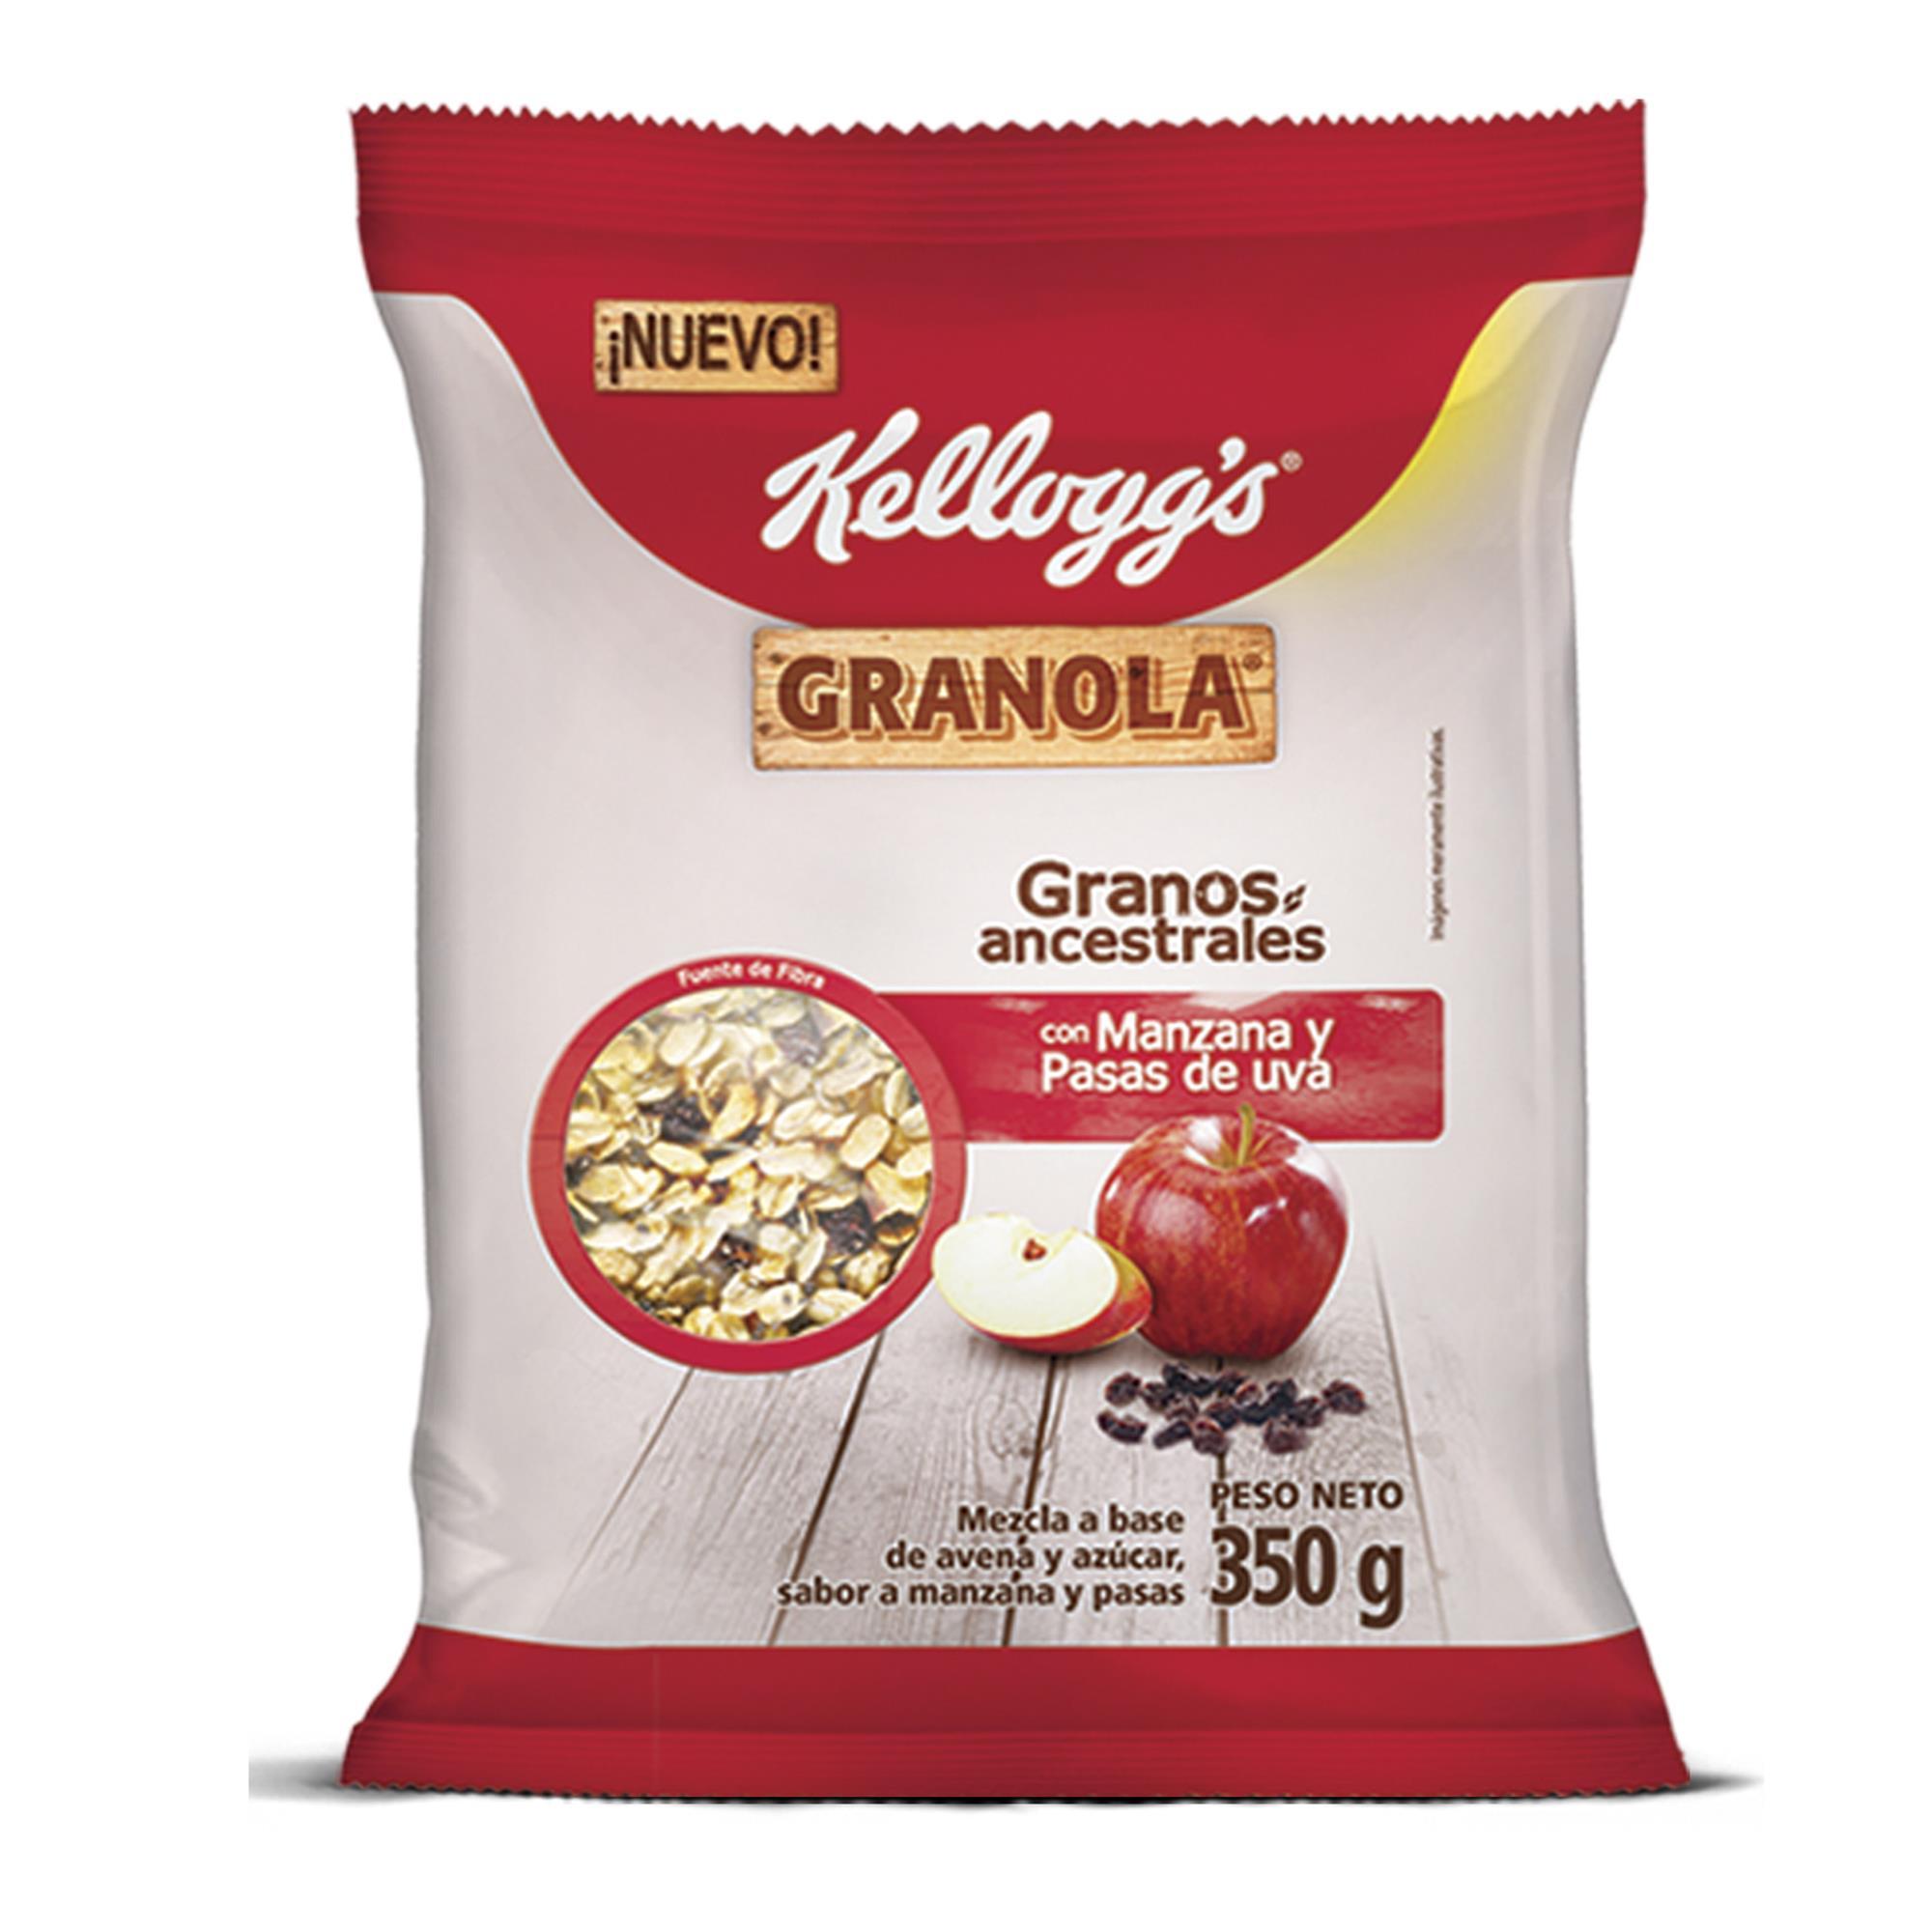 GRANOLA CON MANZANA Y PASAS DE UVA 350 GR KELLOGGS BSA